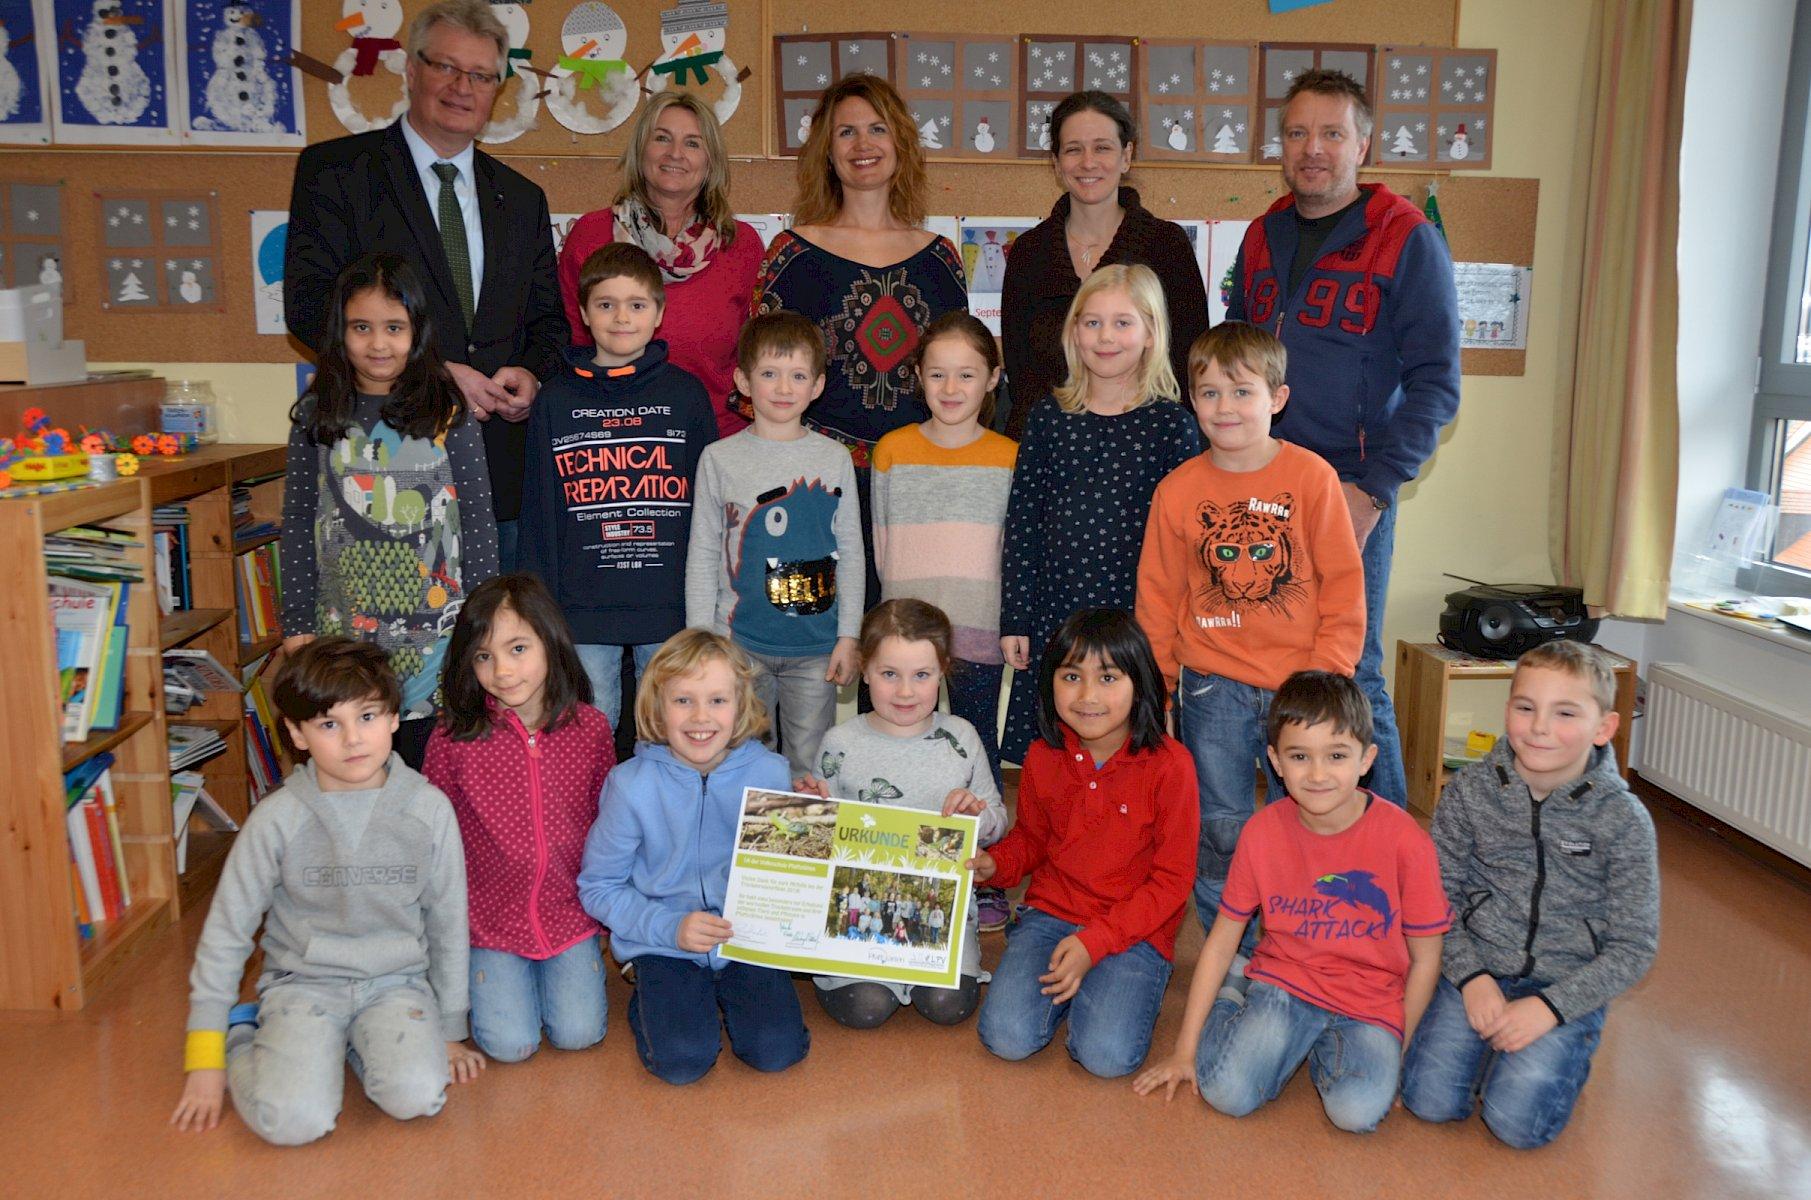 2511 Pfaffsttten - volunteeralert.com